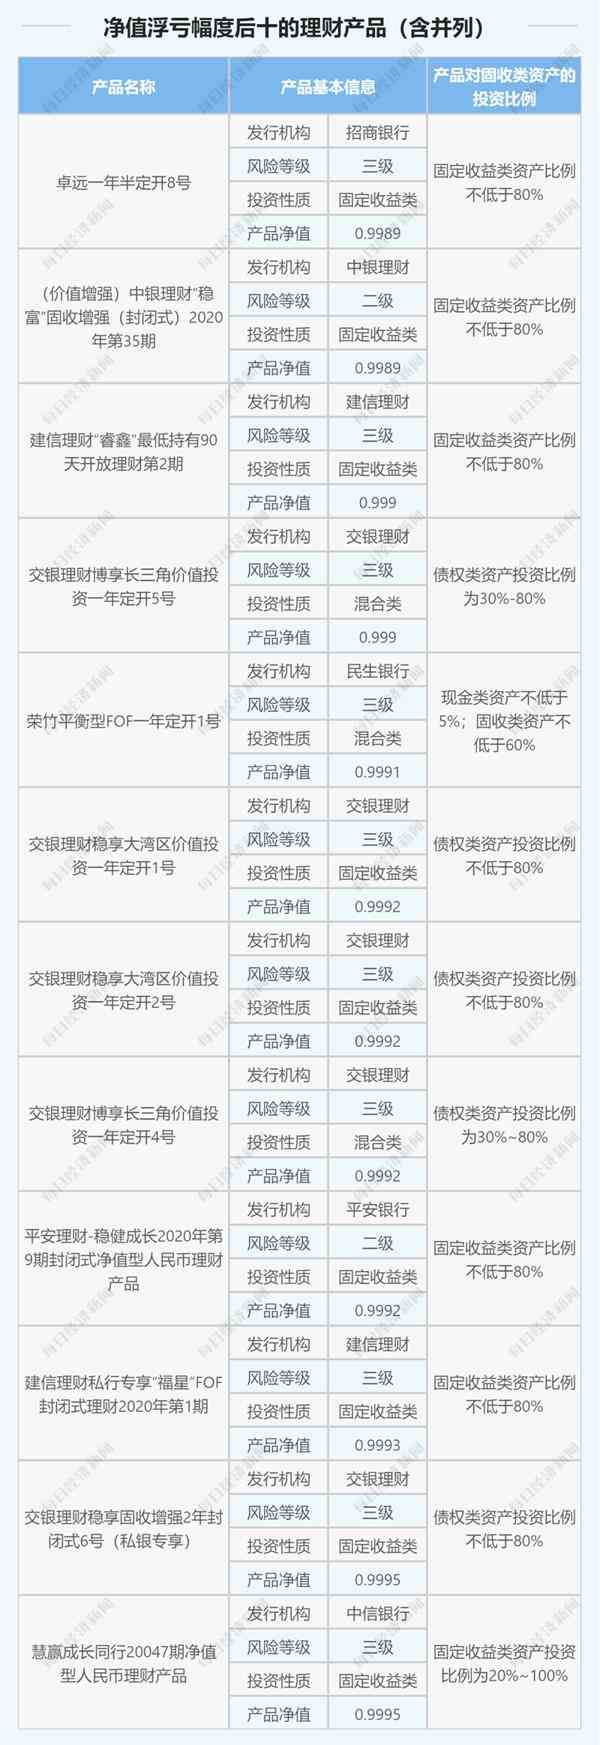 f7ce420e.png?Expires=1908661148&OSSAccessKeyId=LTAIcYTsN8IjKgNY&Signature=SAx7vnT8lyot%2Fse3IHXZetXiVz0%3D